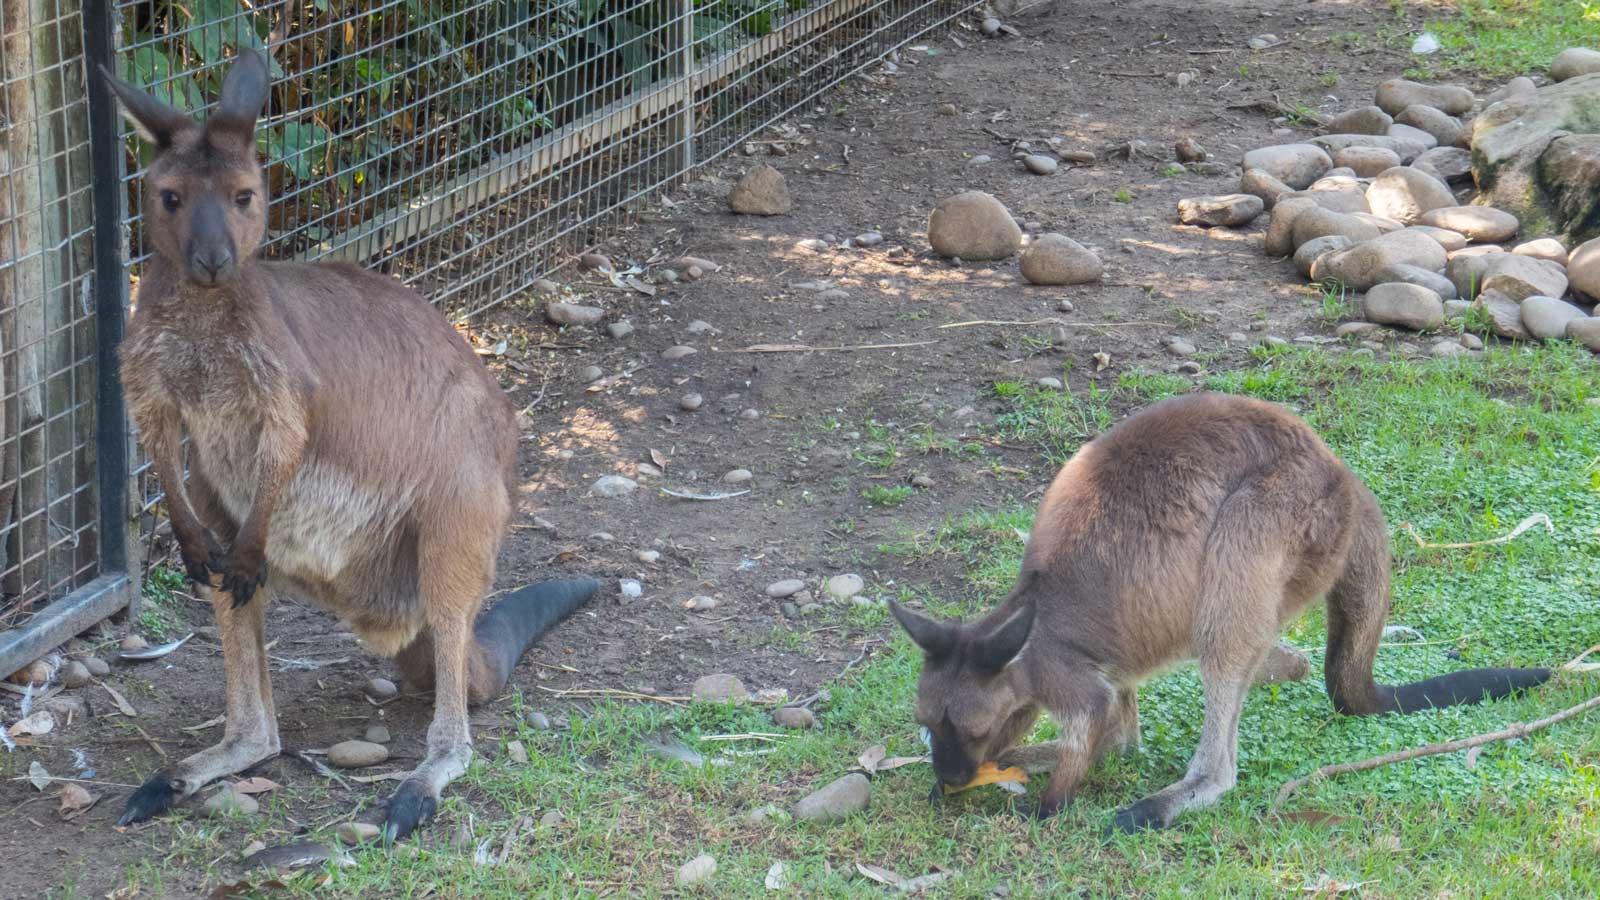 Kangaroos at Featherdale Wildlife Park Sydney Australia